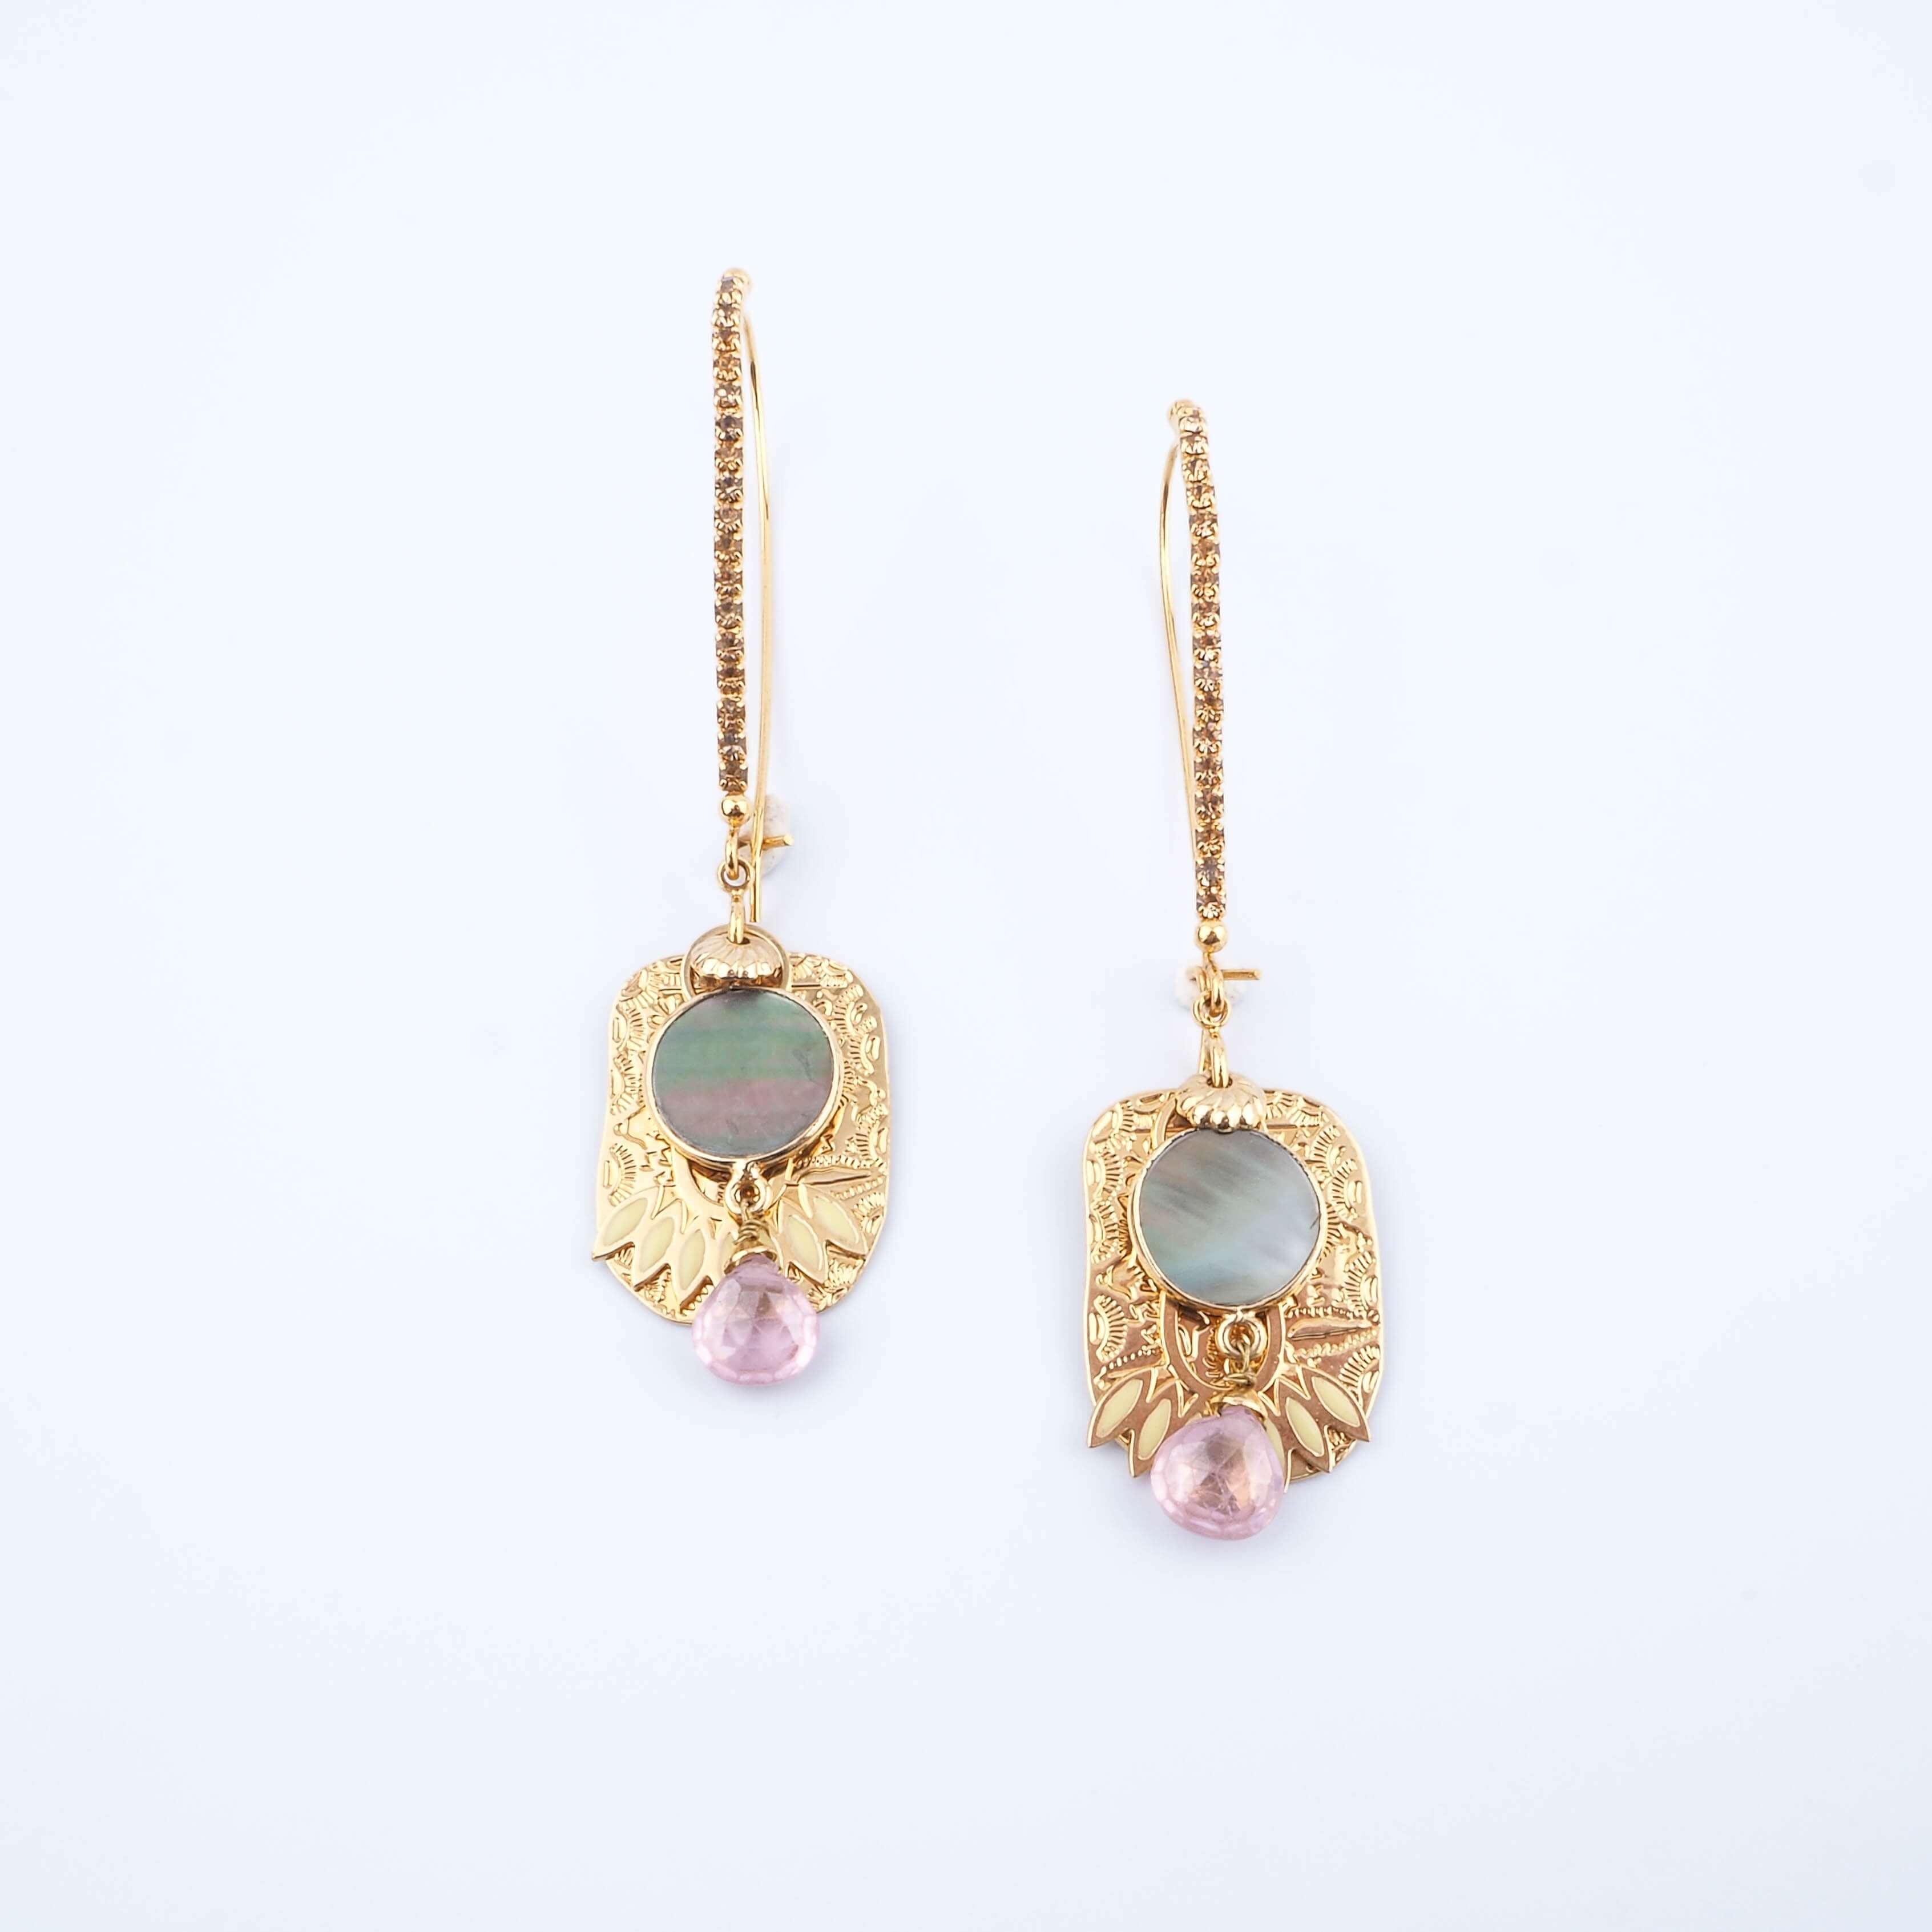 Boucles d'oreilles El Dorado - GAS Bijoux